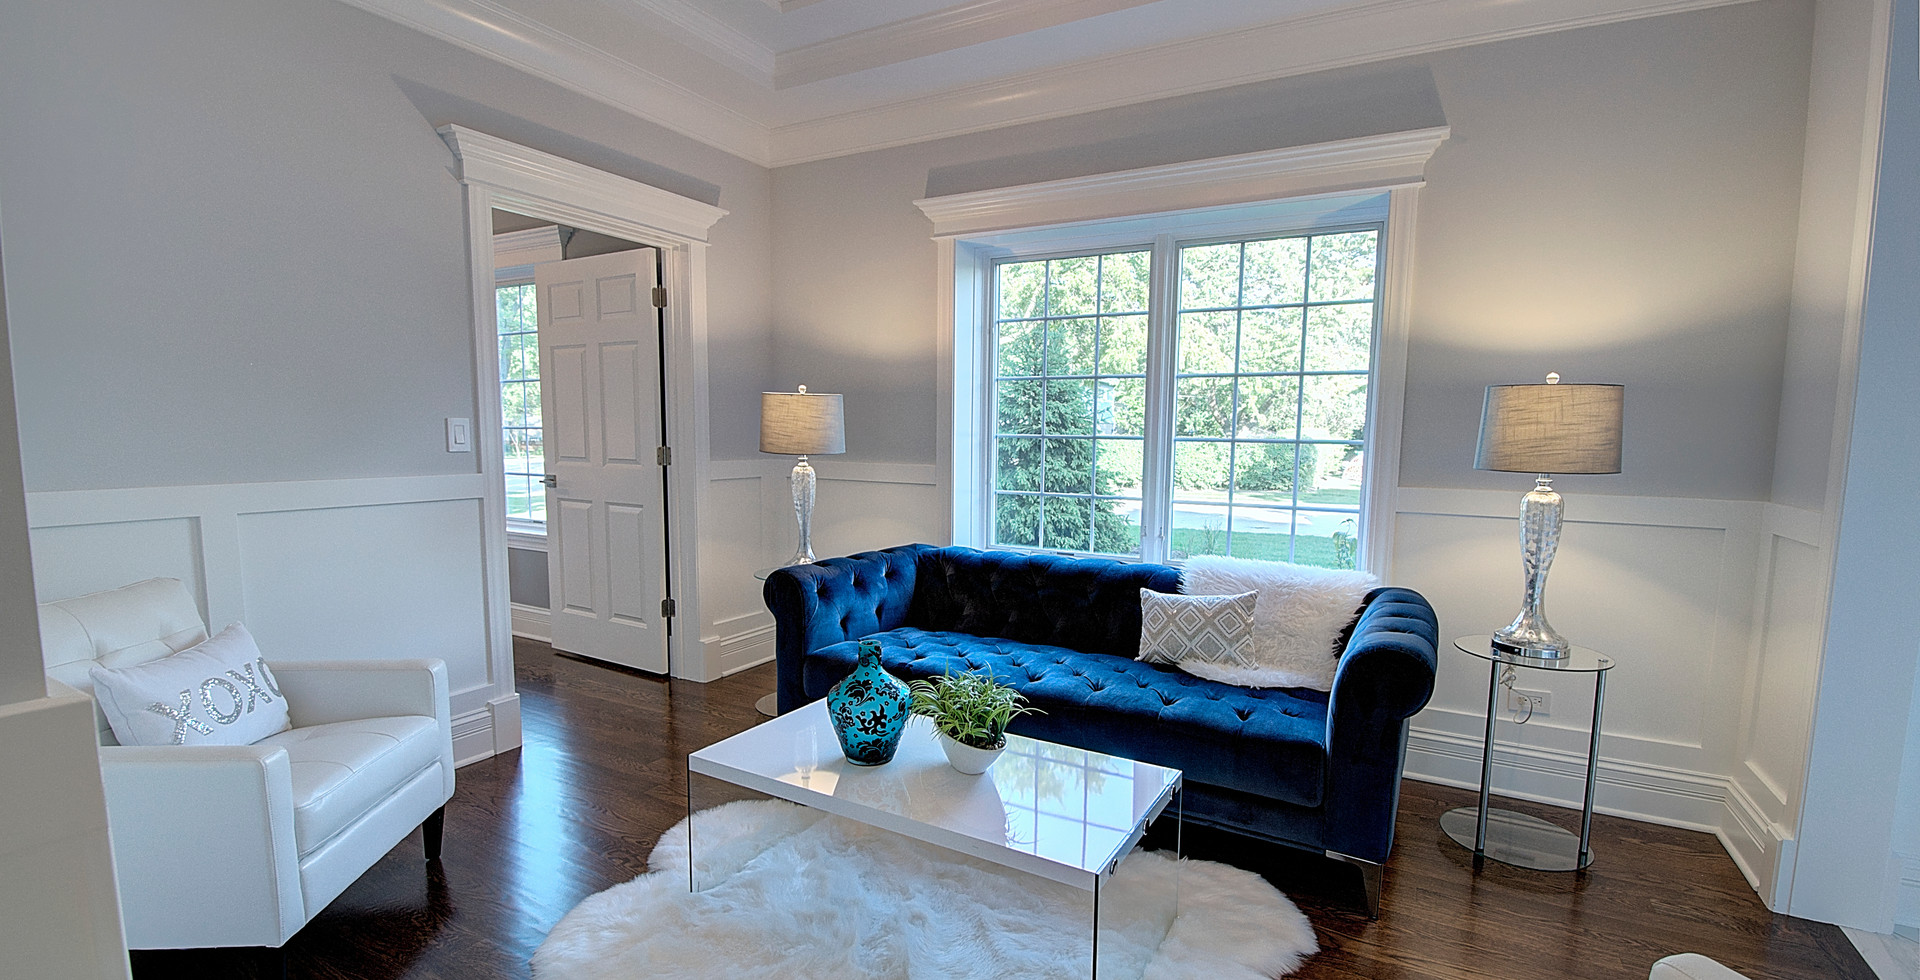 Living Room in Bolingbrook designed by MRM Home Design.jpg